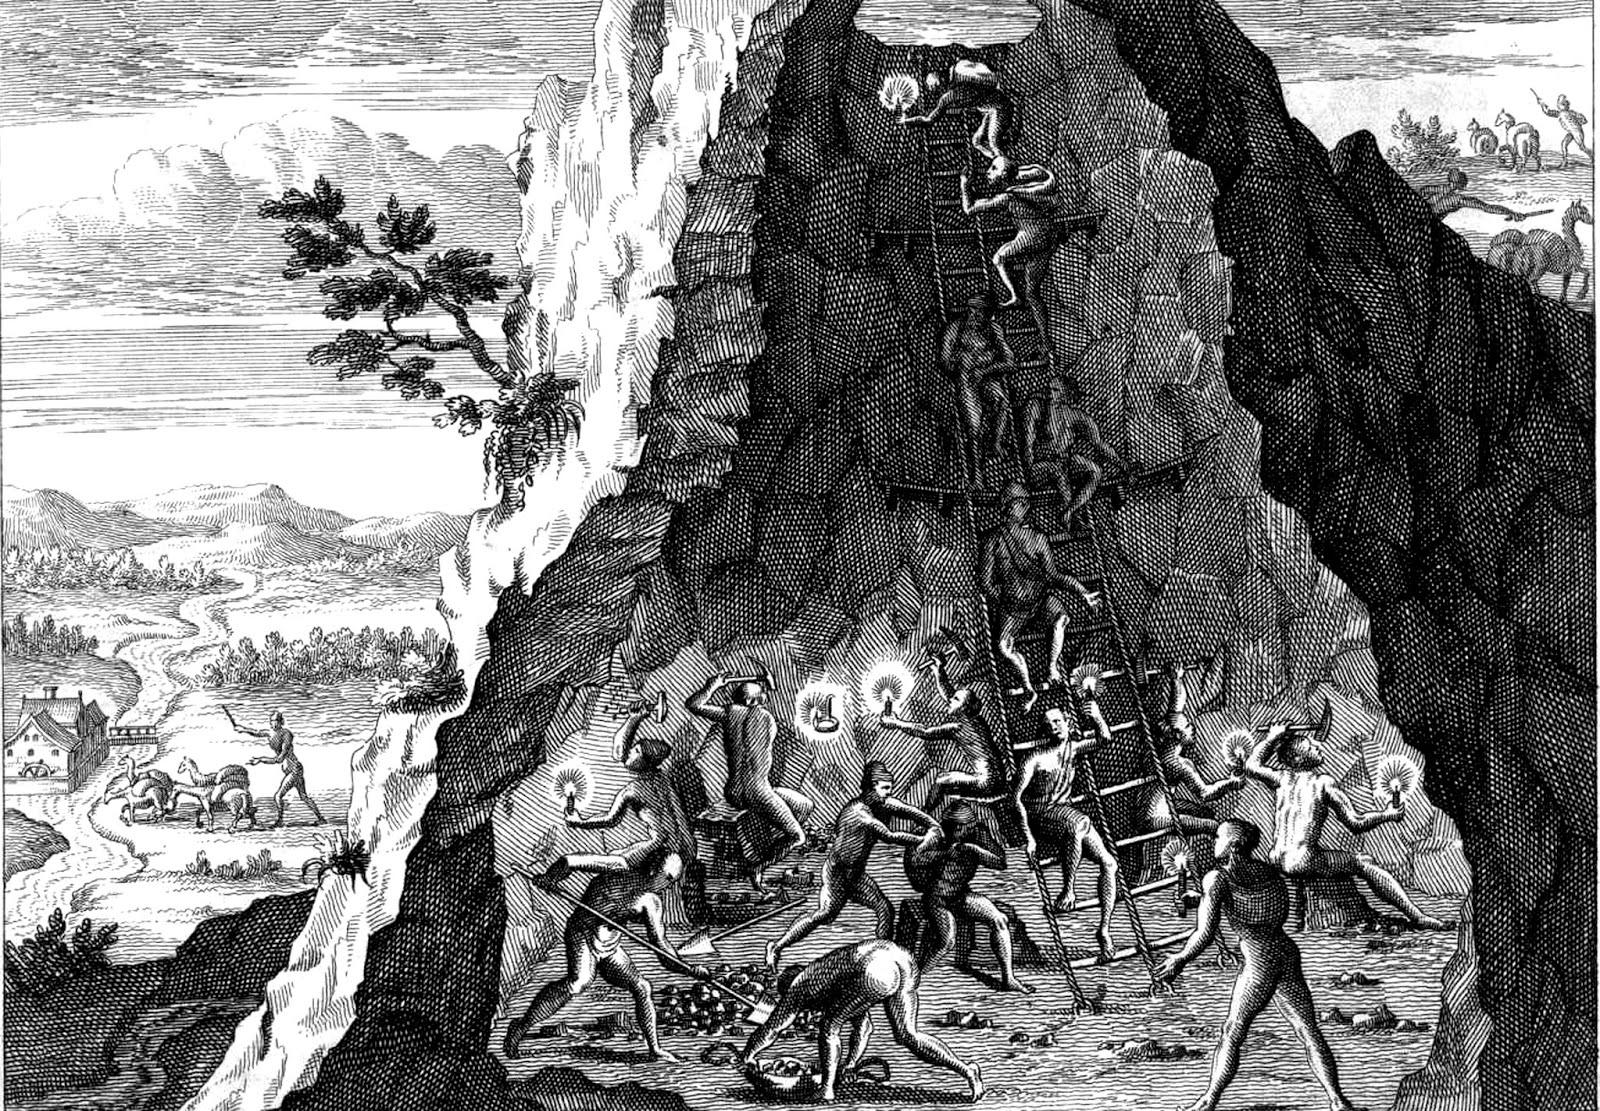 Mineros Potosi Theodoor de Bry Novi Orbis 1596